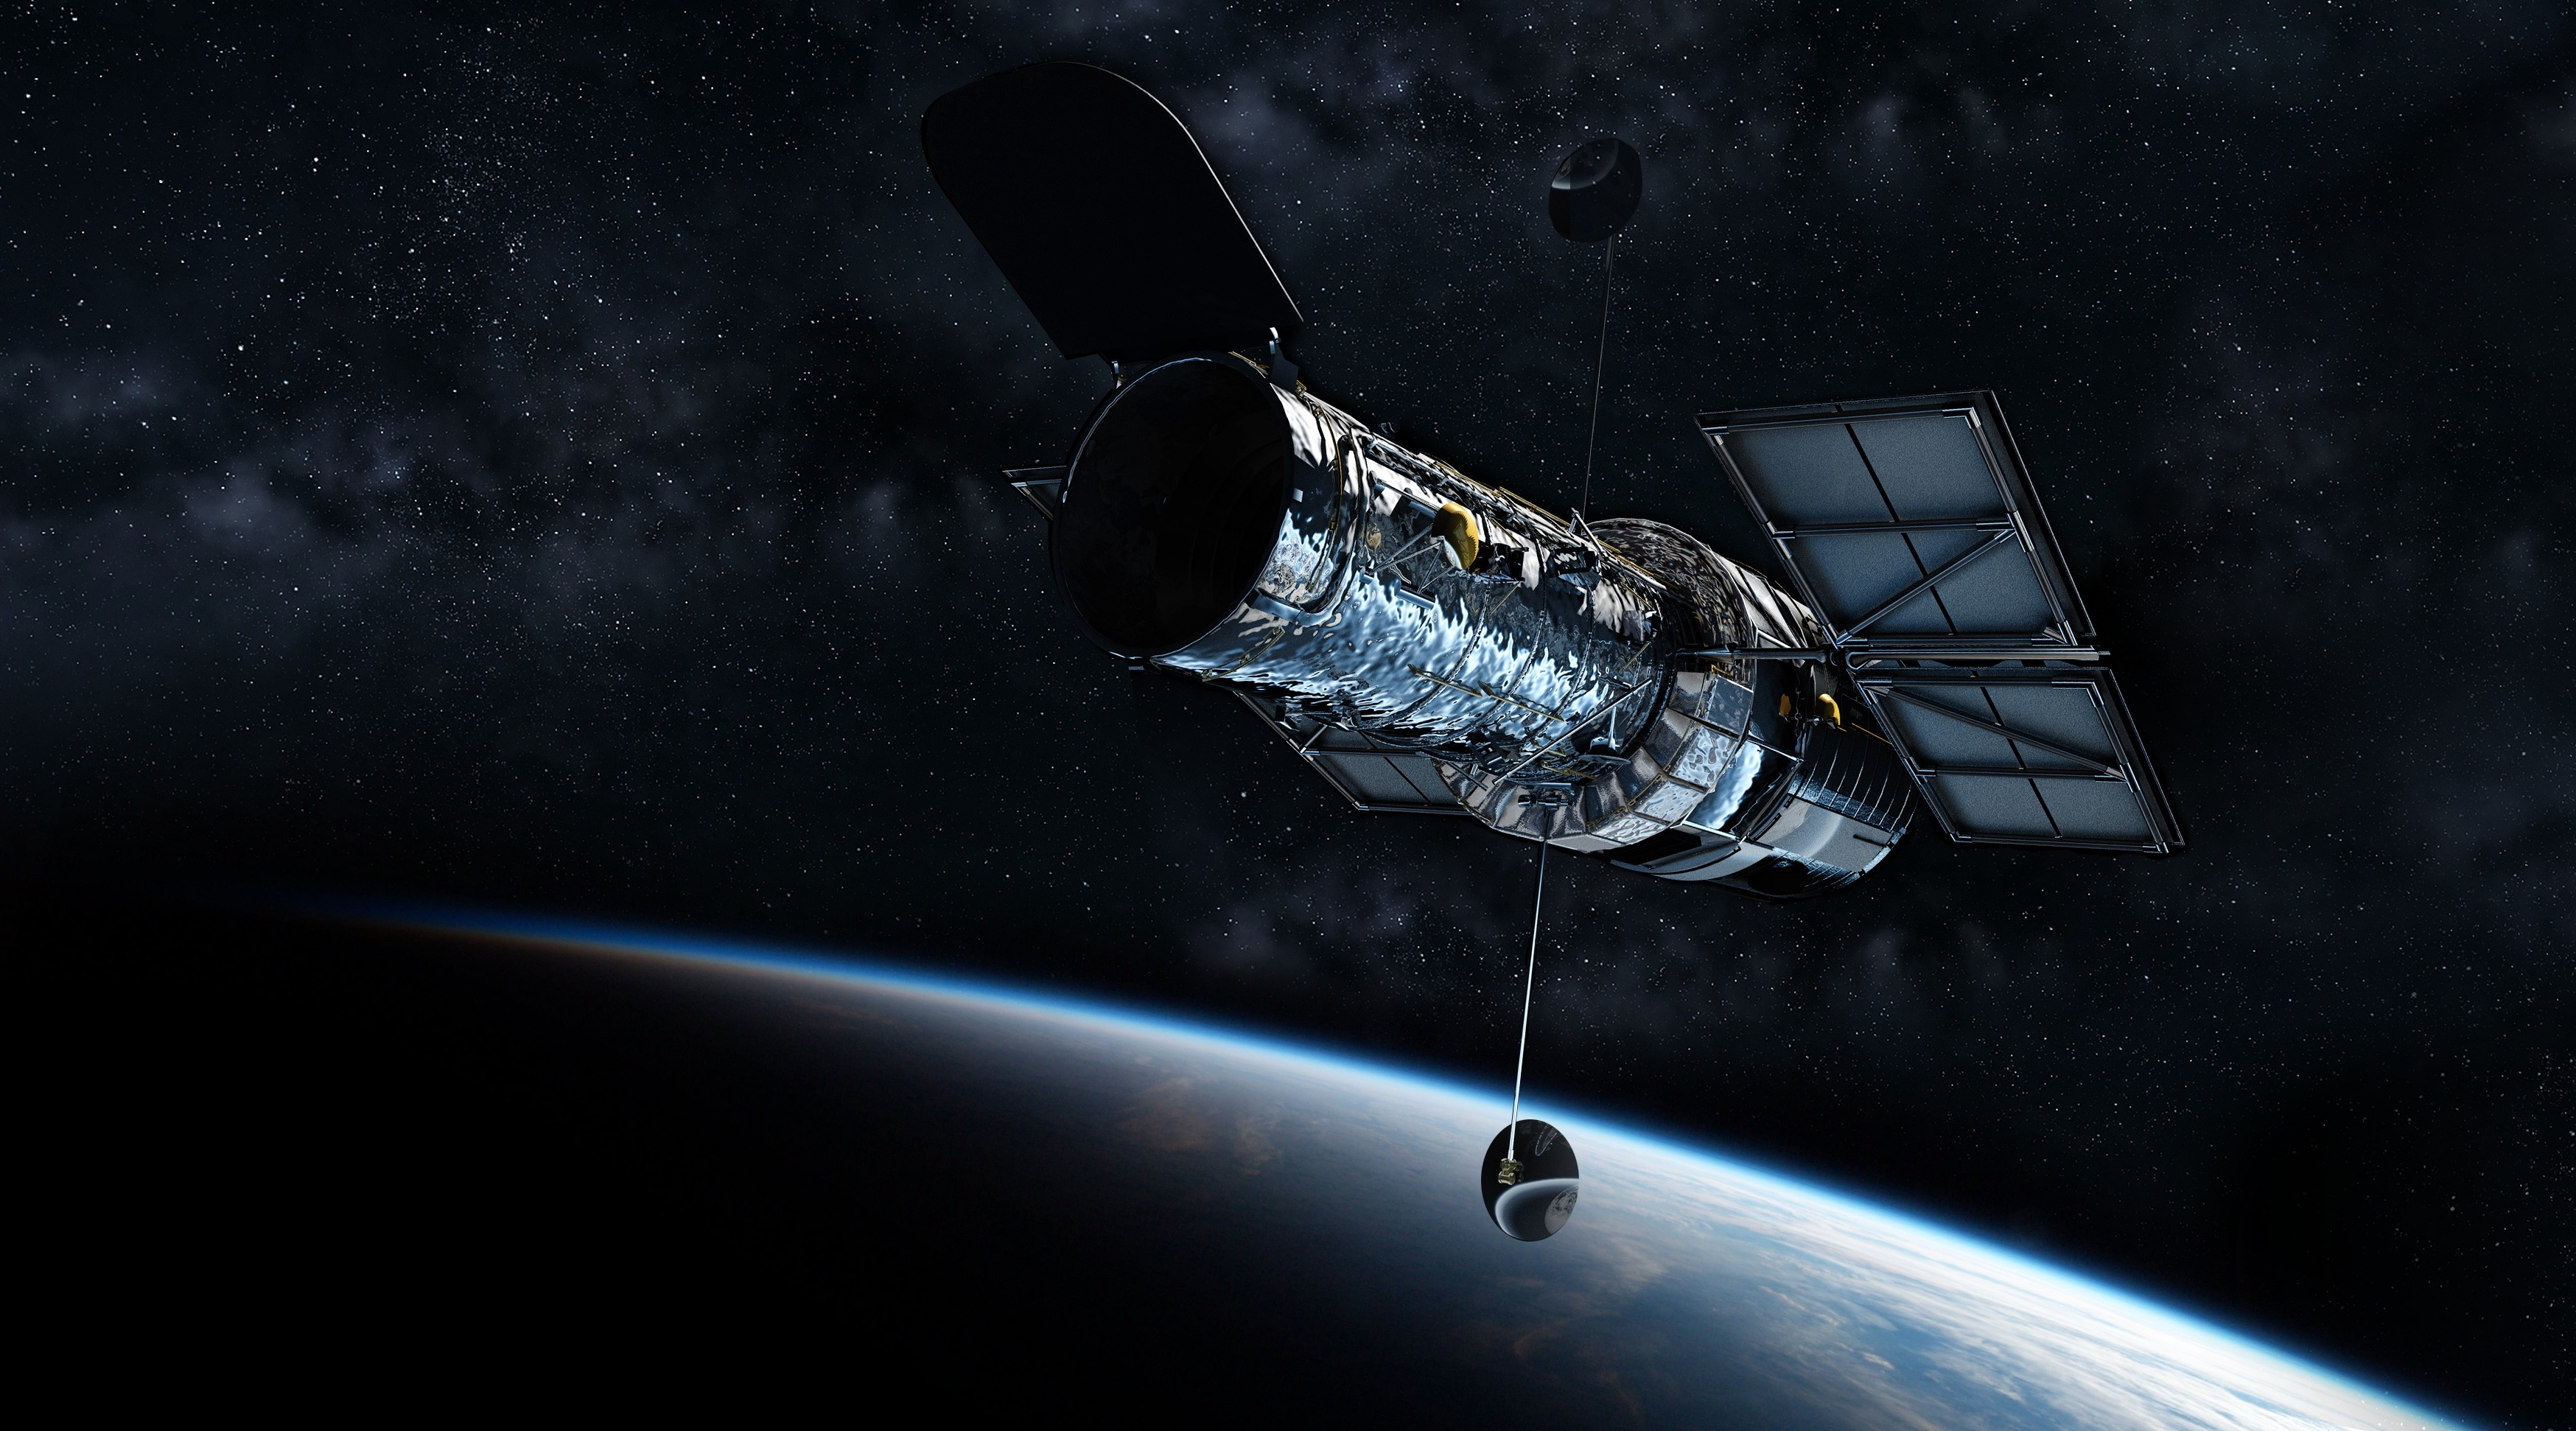 Norbert Biedrzycki kosmos satelita